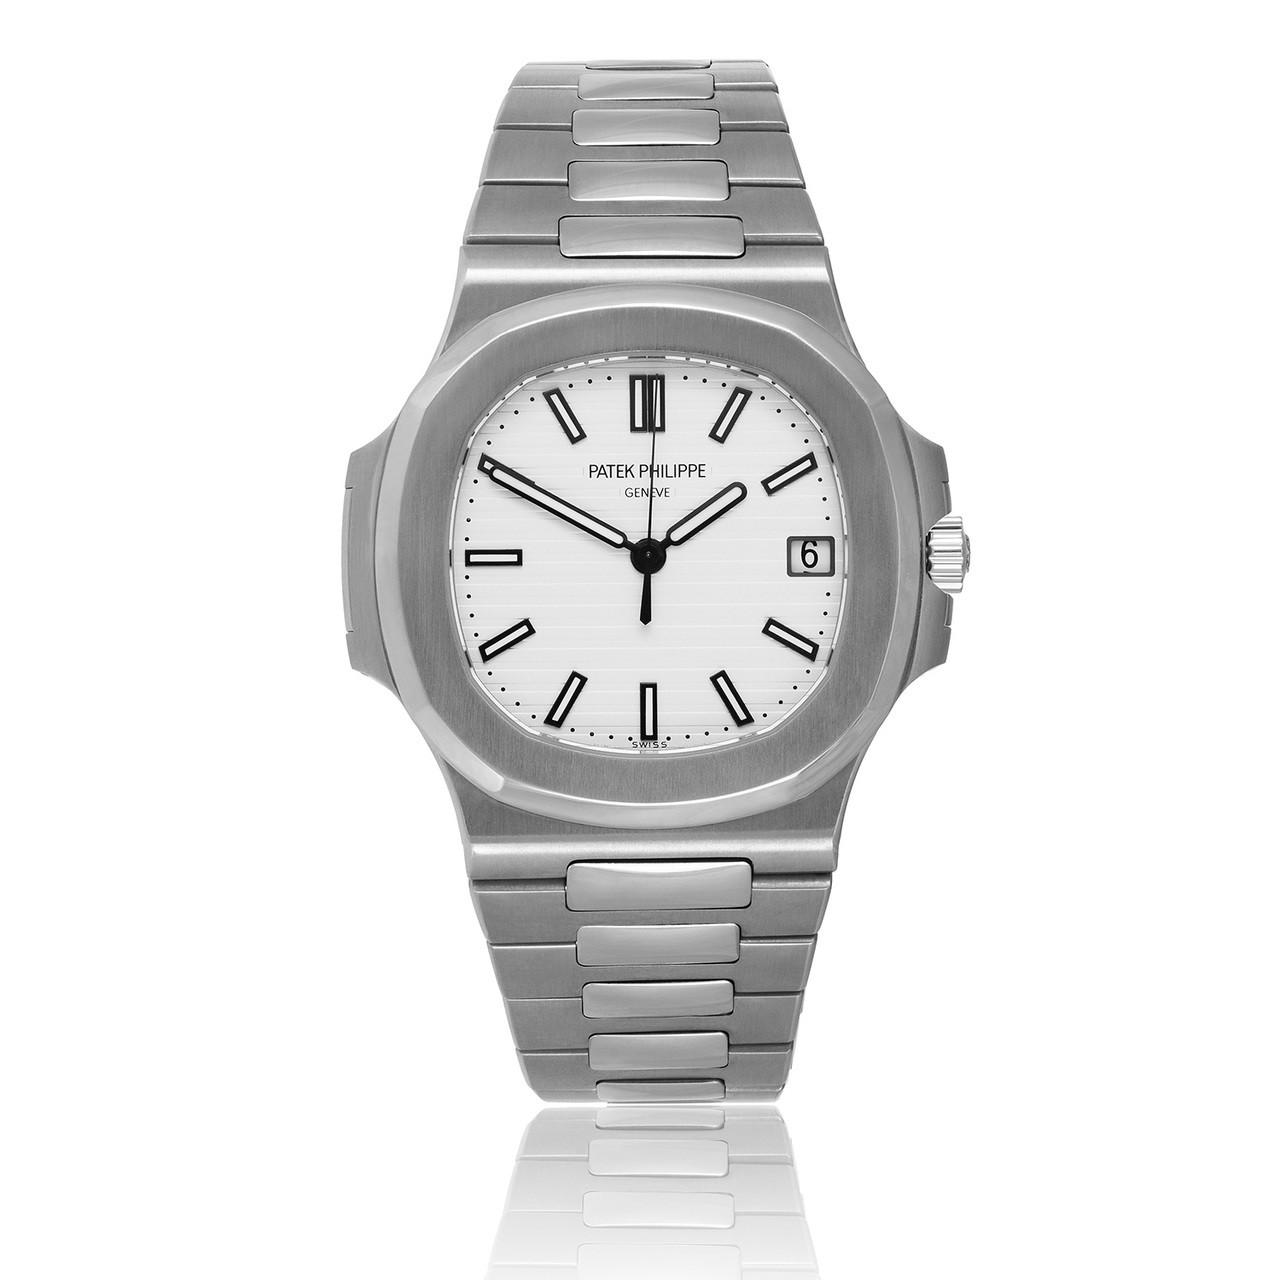 Patek Philippe Nautilus 5711 1a Stainless Steel Watch Shyne Jewelers